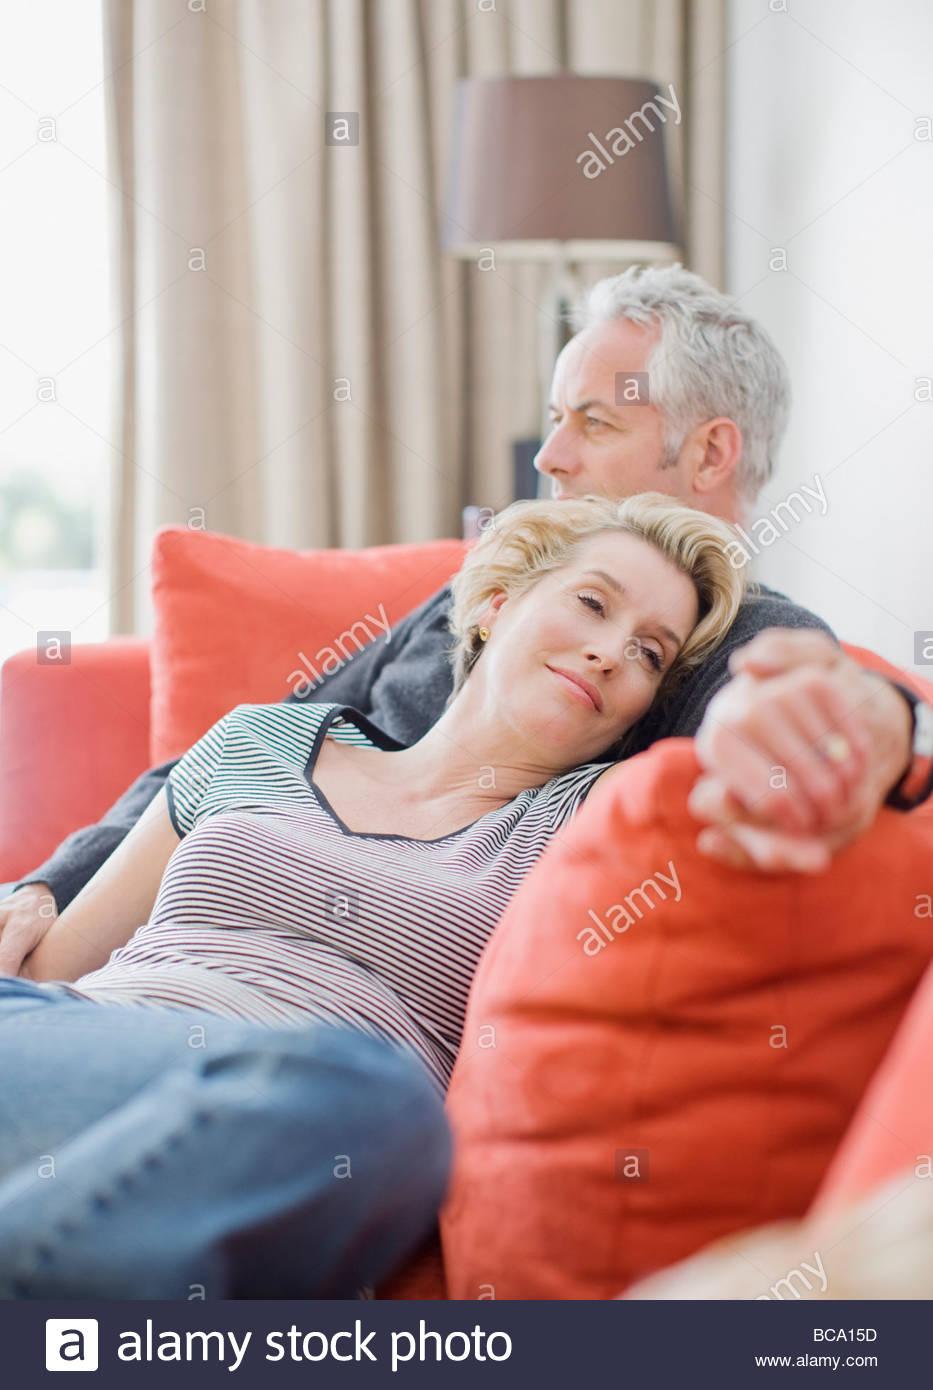 Couple laying on sofa - Stock Image